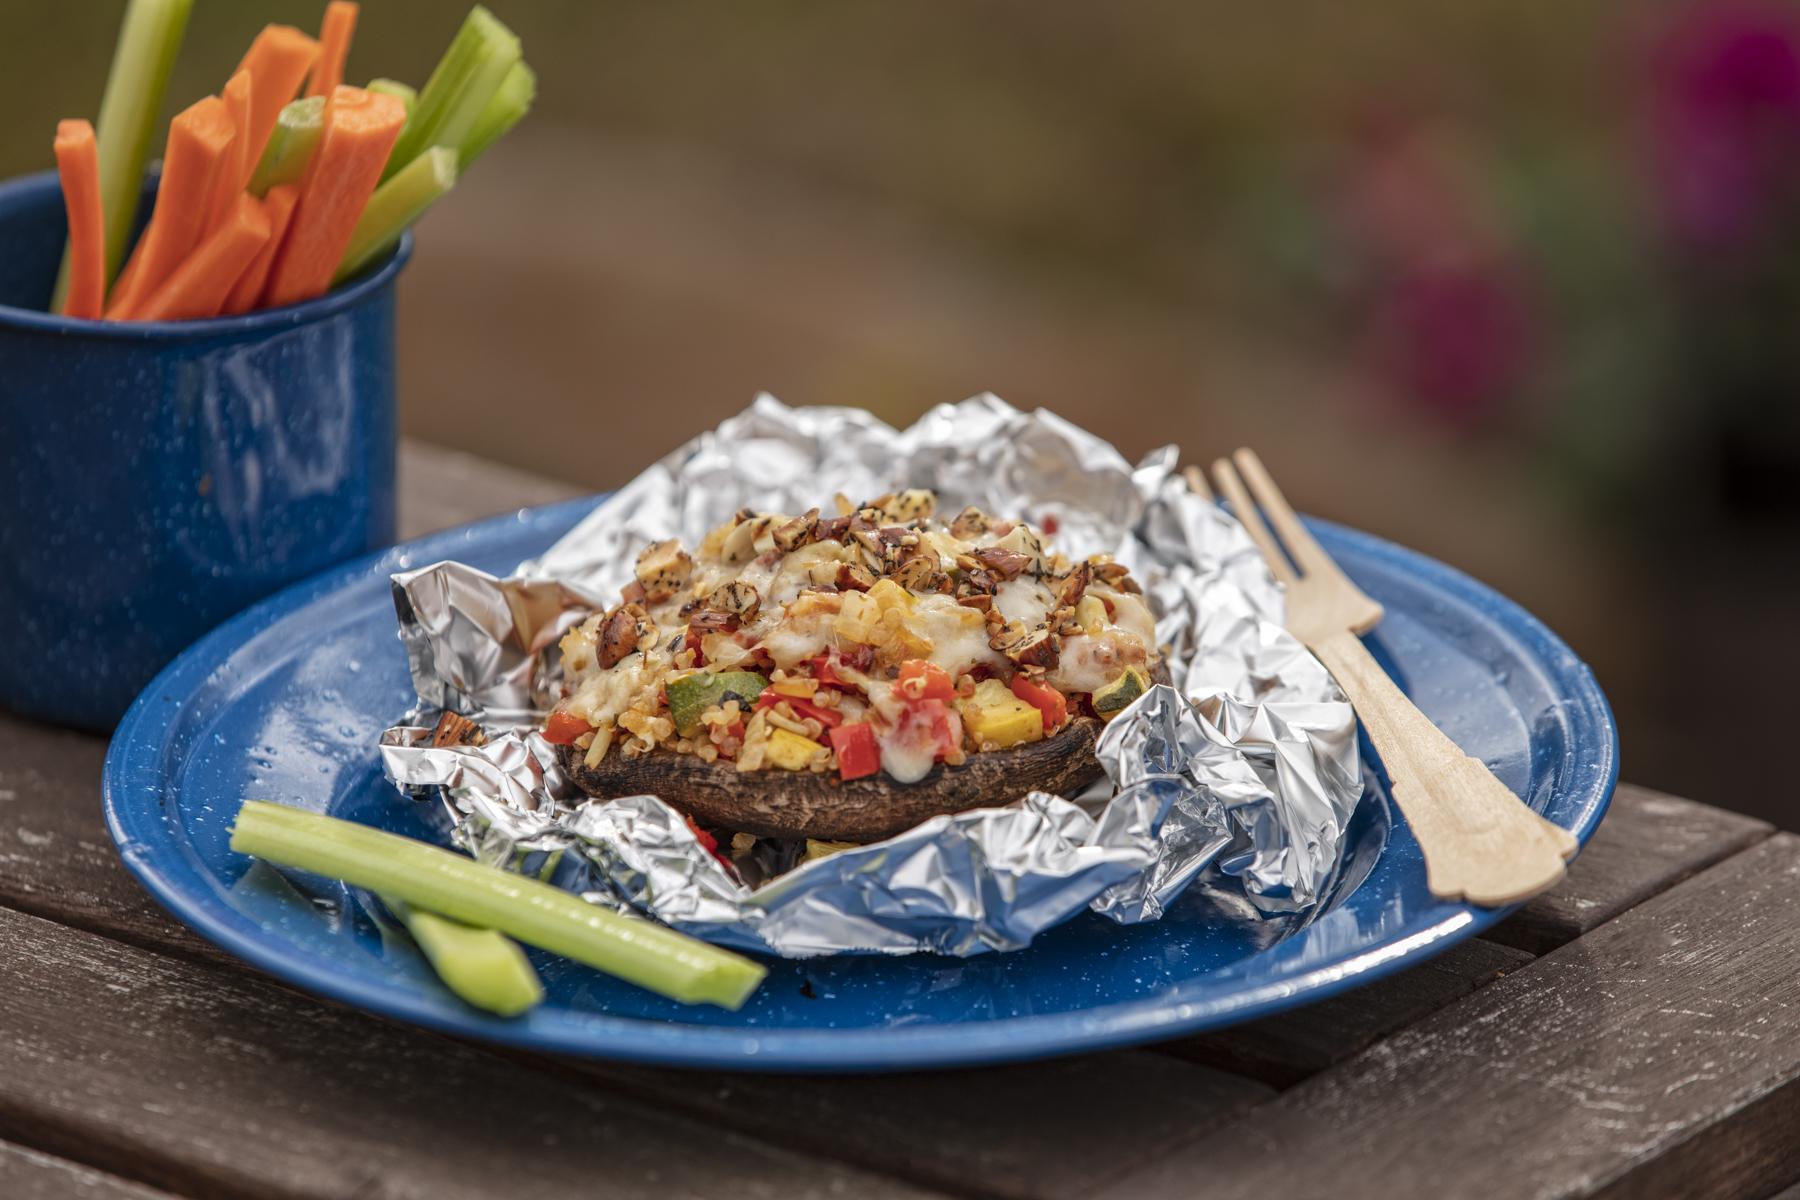 Veggie Sun-Dried Tomato and Nut Stuffed Portobello Mushrooms -